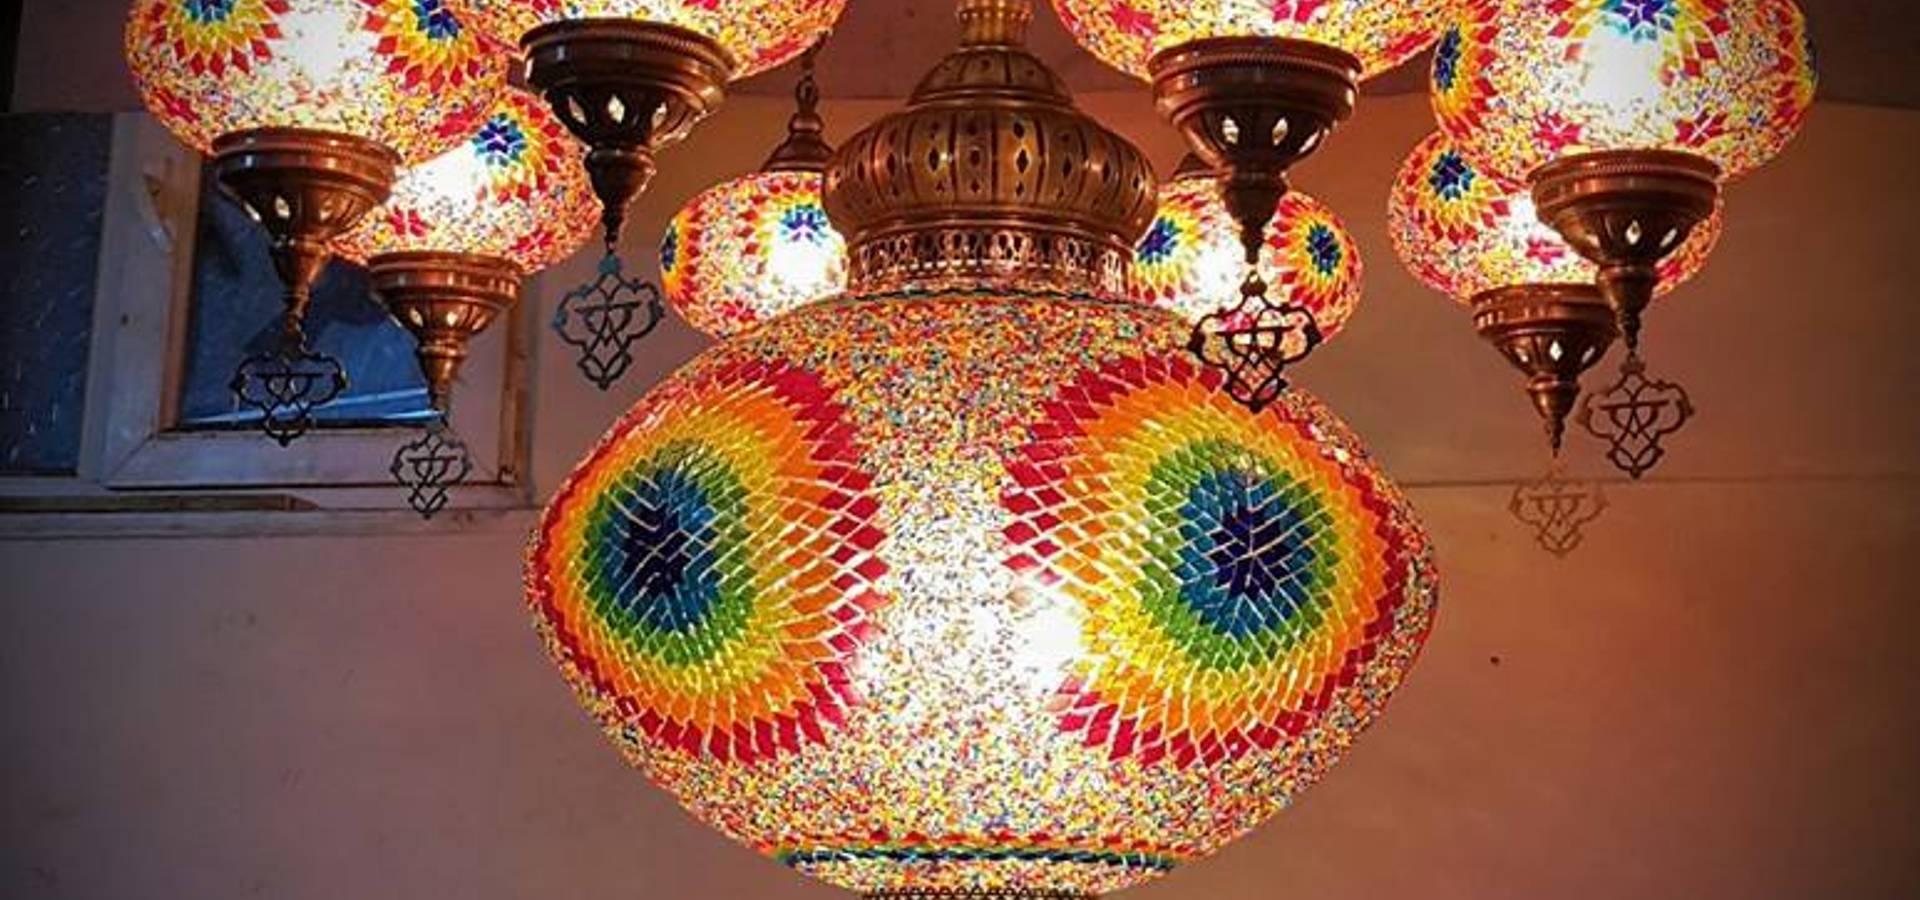 Atölye Lamp